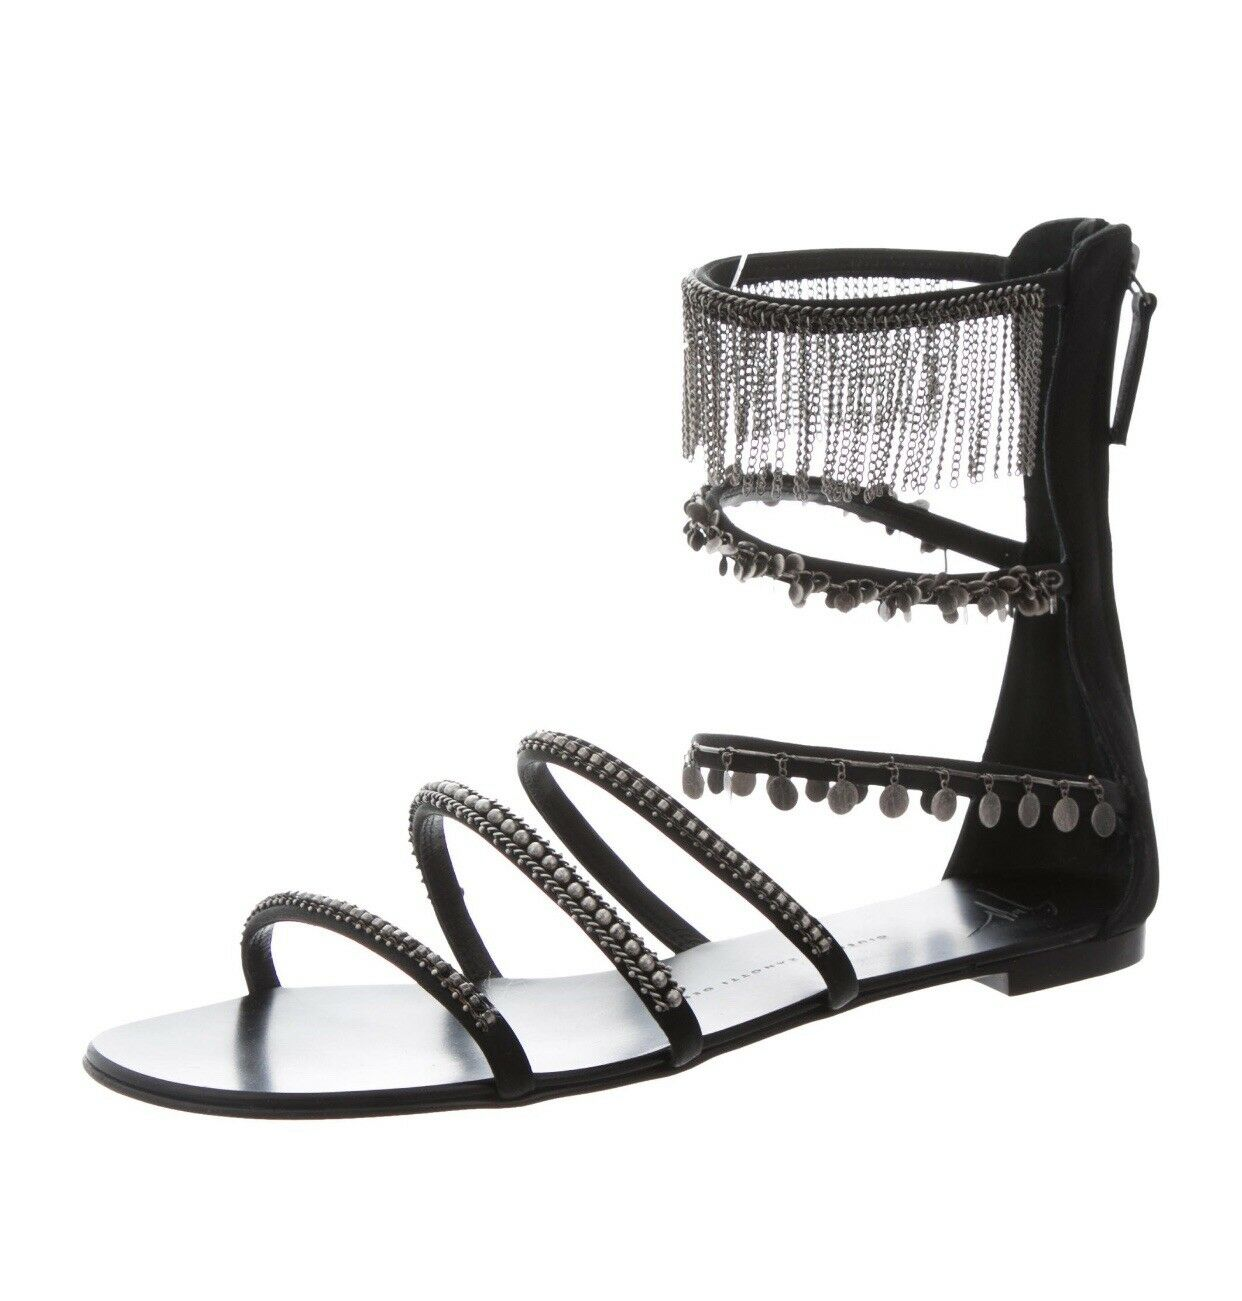 1.3K Giuseppe Zanotti Roll 10 Luxos Luxos Luxos Chain Zipper Gladiator Flat Sandals Size 41 94e5aa